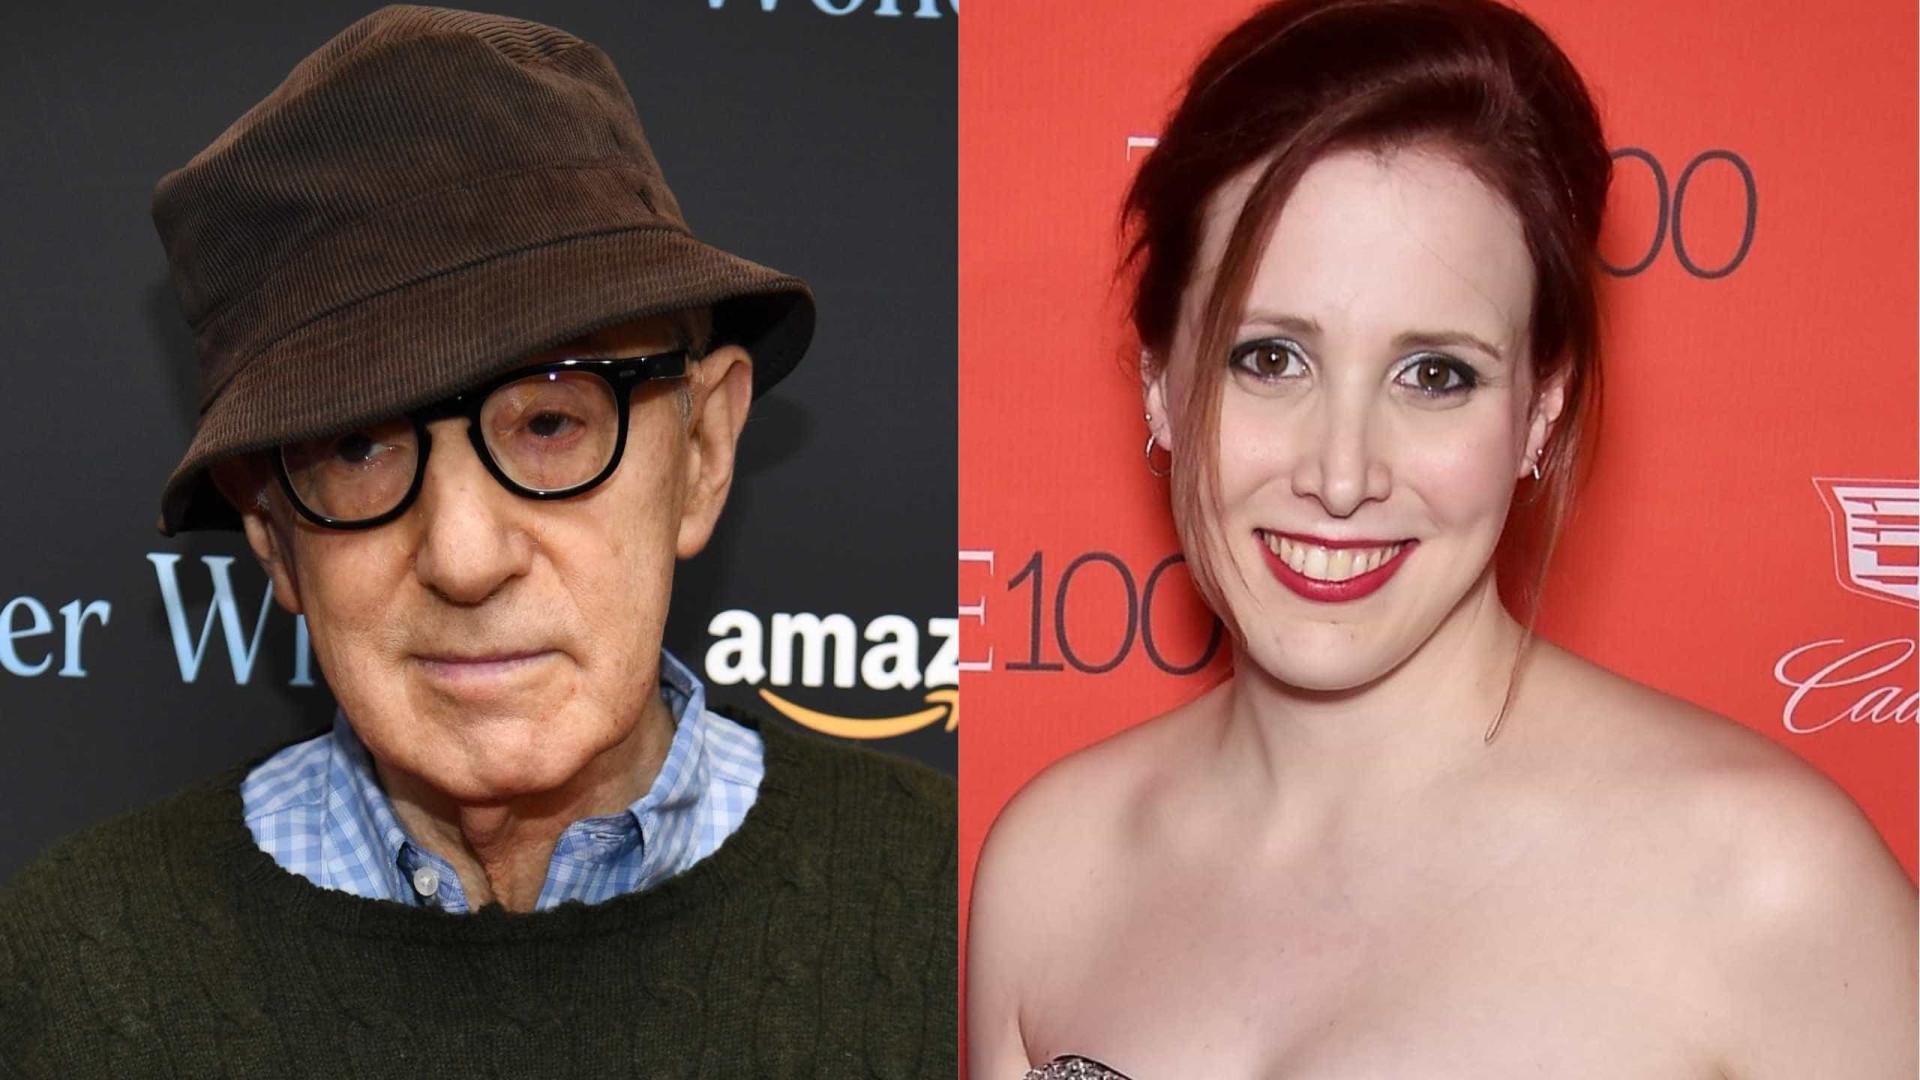 Filha de Woody Allen diz que foi abusada aos 7 anos